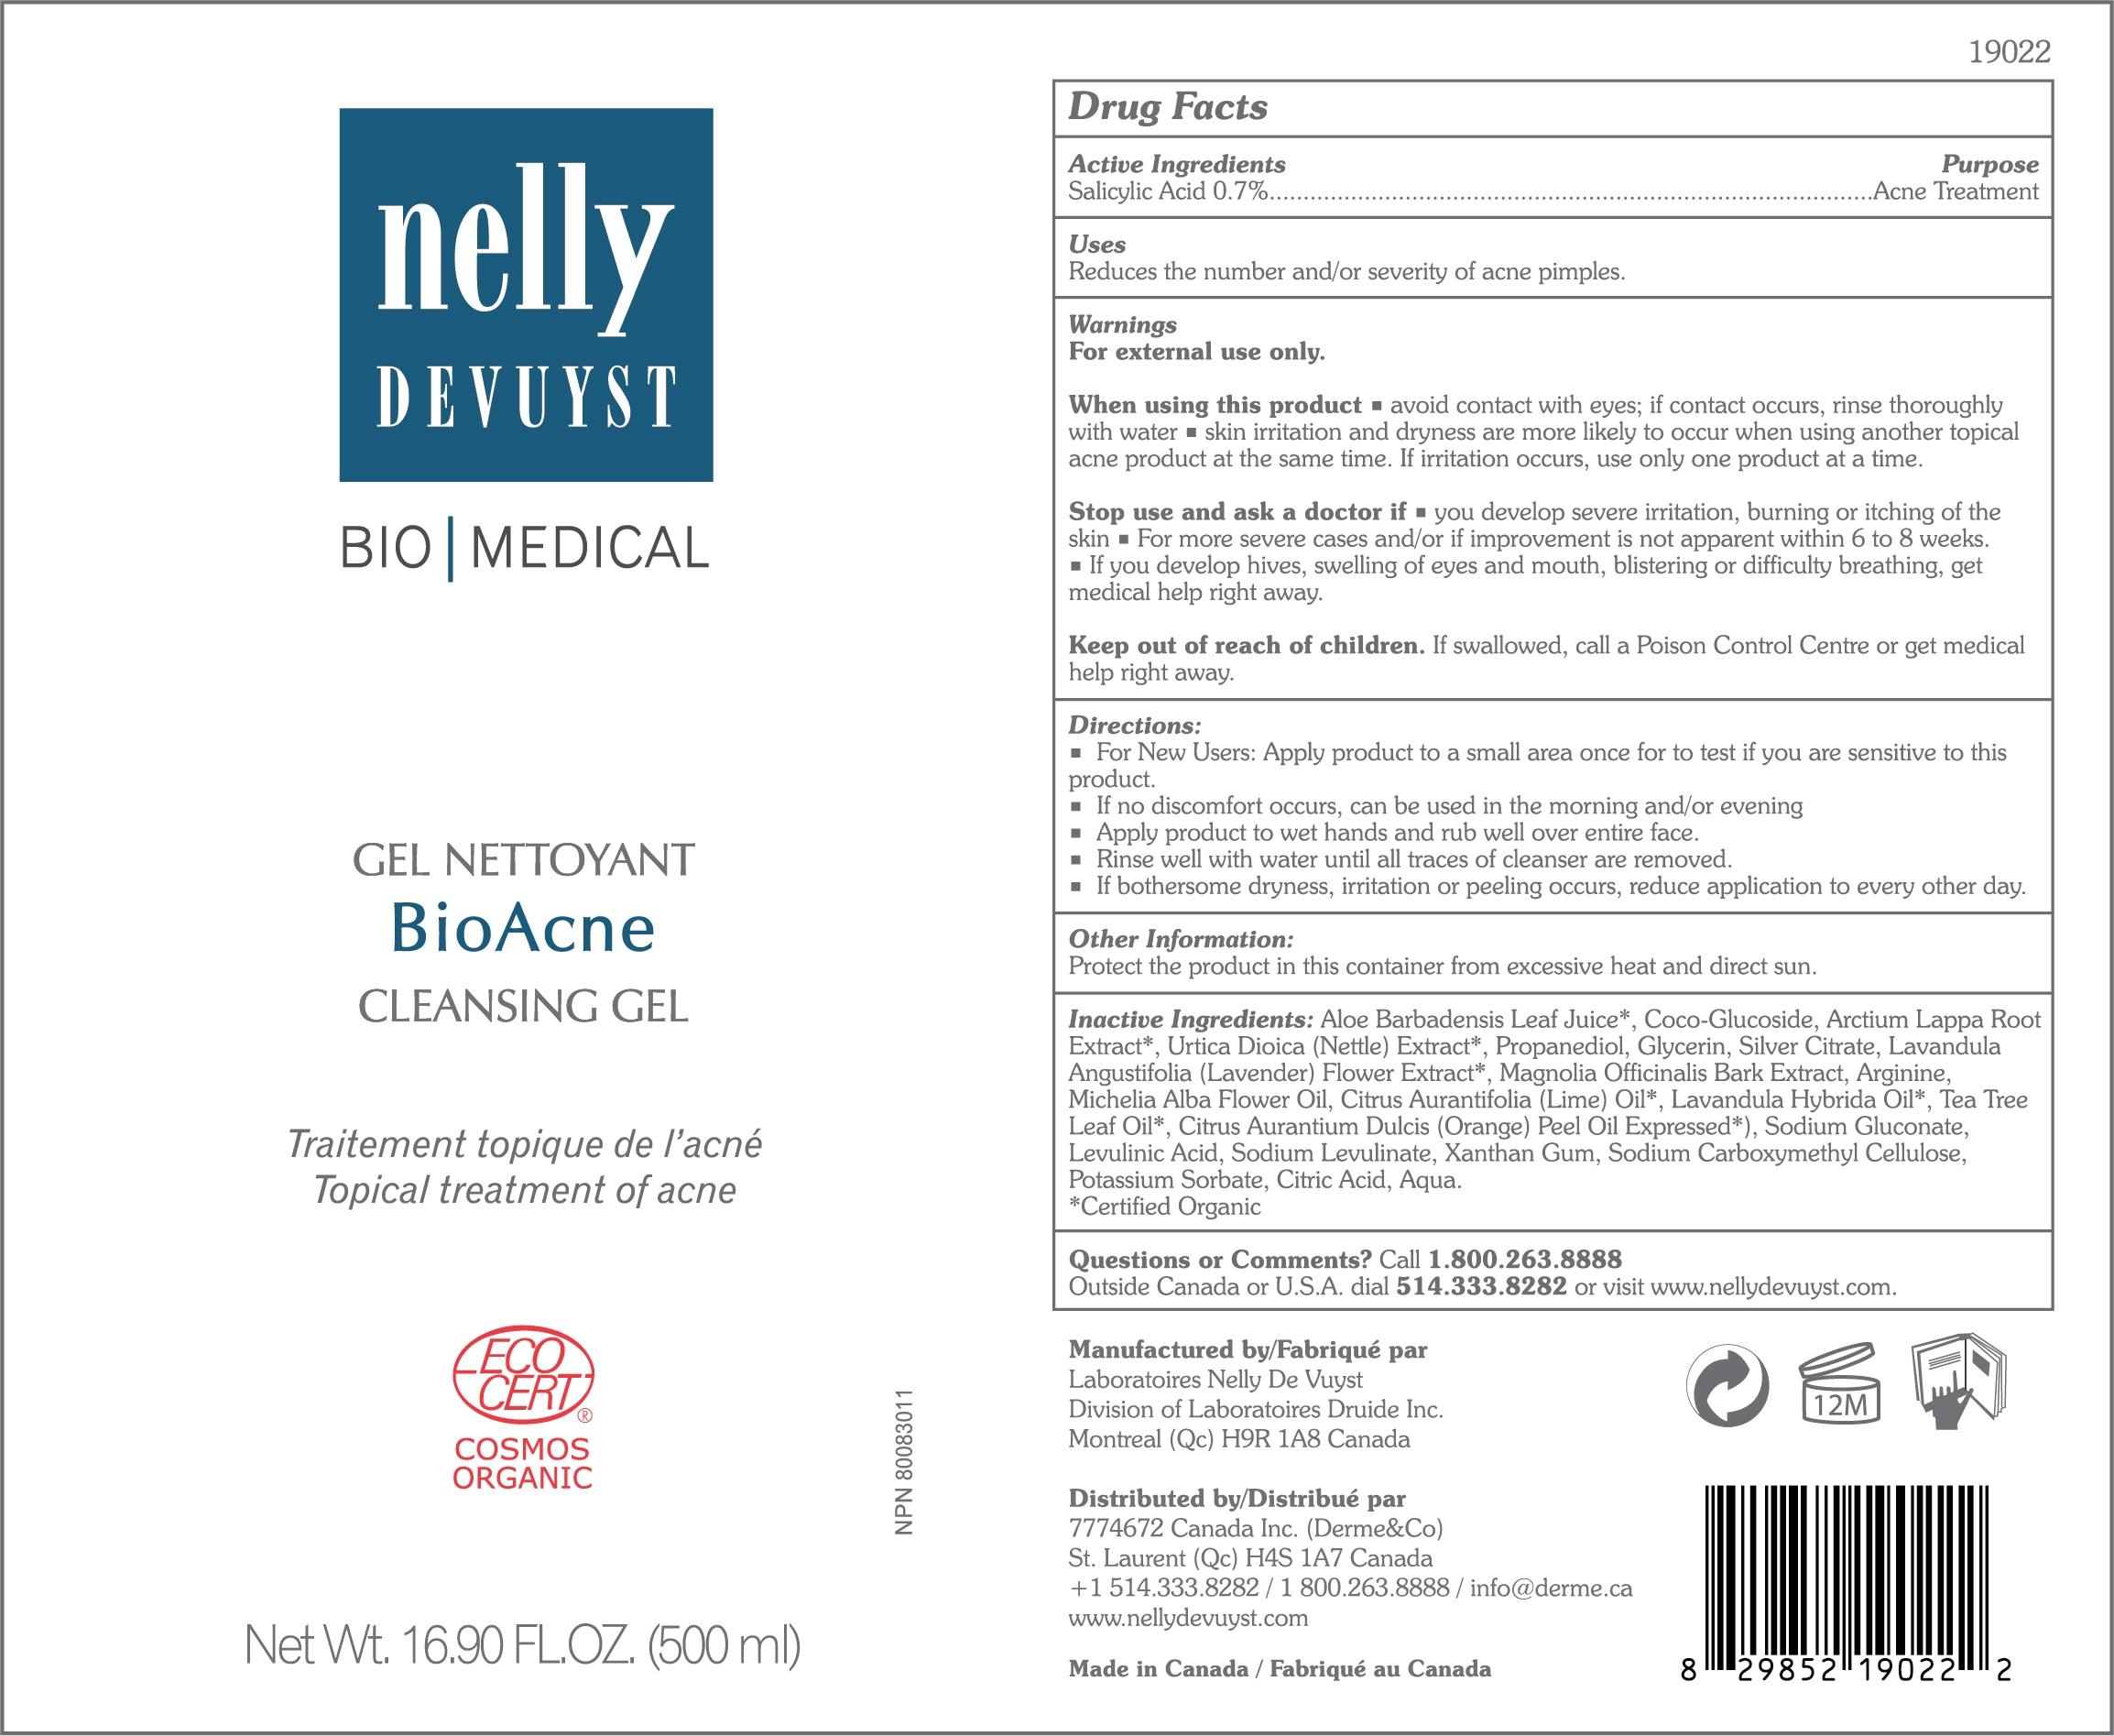 Nelly Devuyst Cleansing Gel BioAcne 500ml